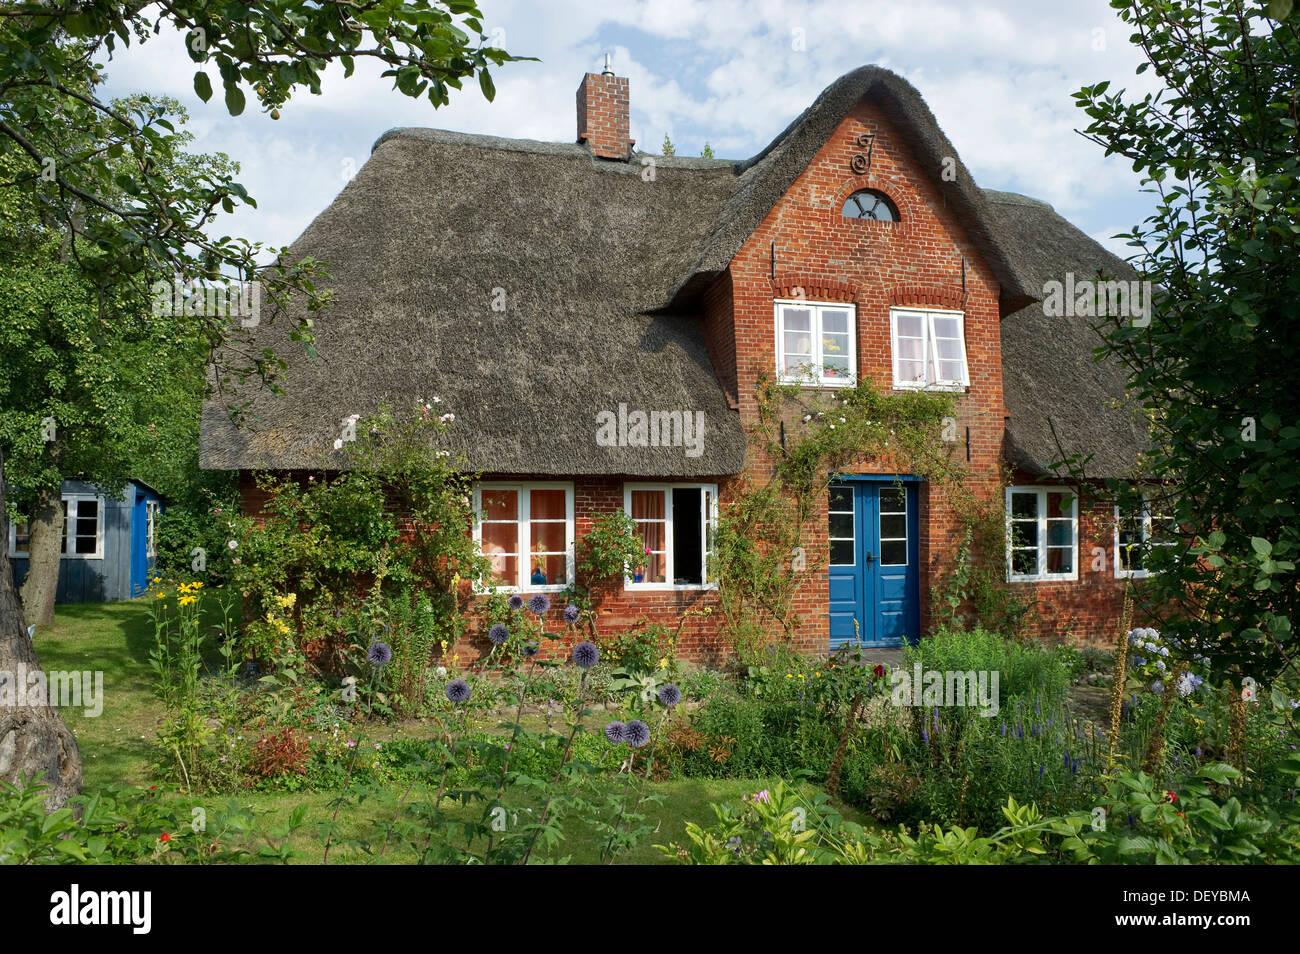 Thatched cottage and cottage garden, Nebel, Amrum, North Frisian Islands, Schleswig-Holstein - Stock Image